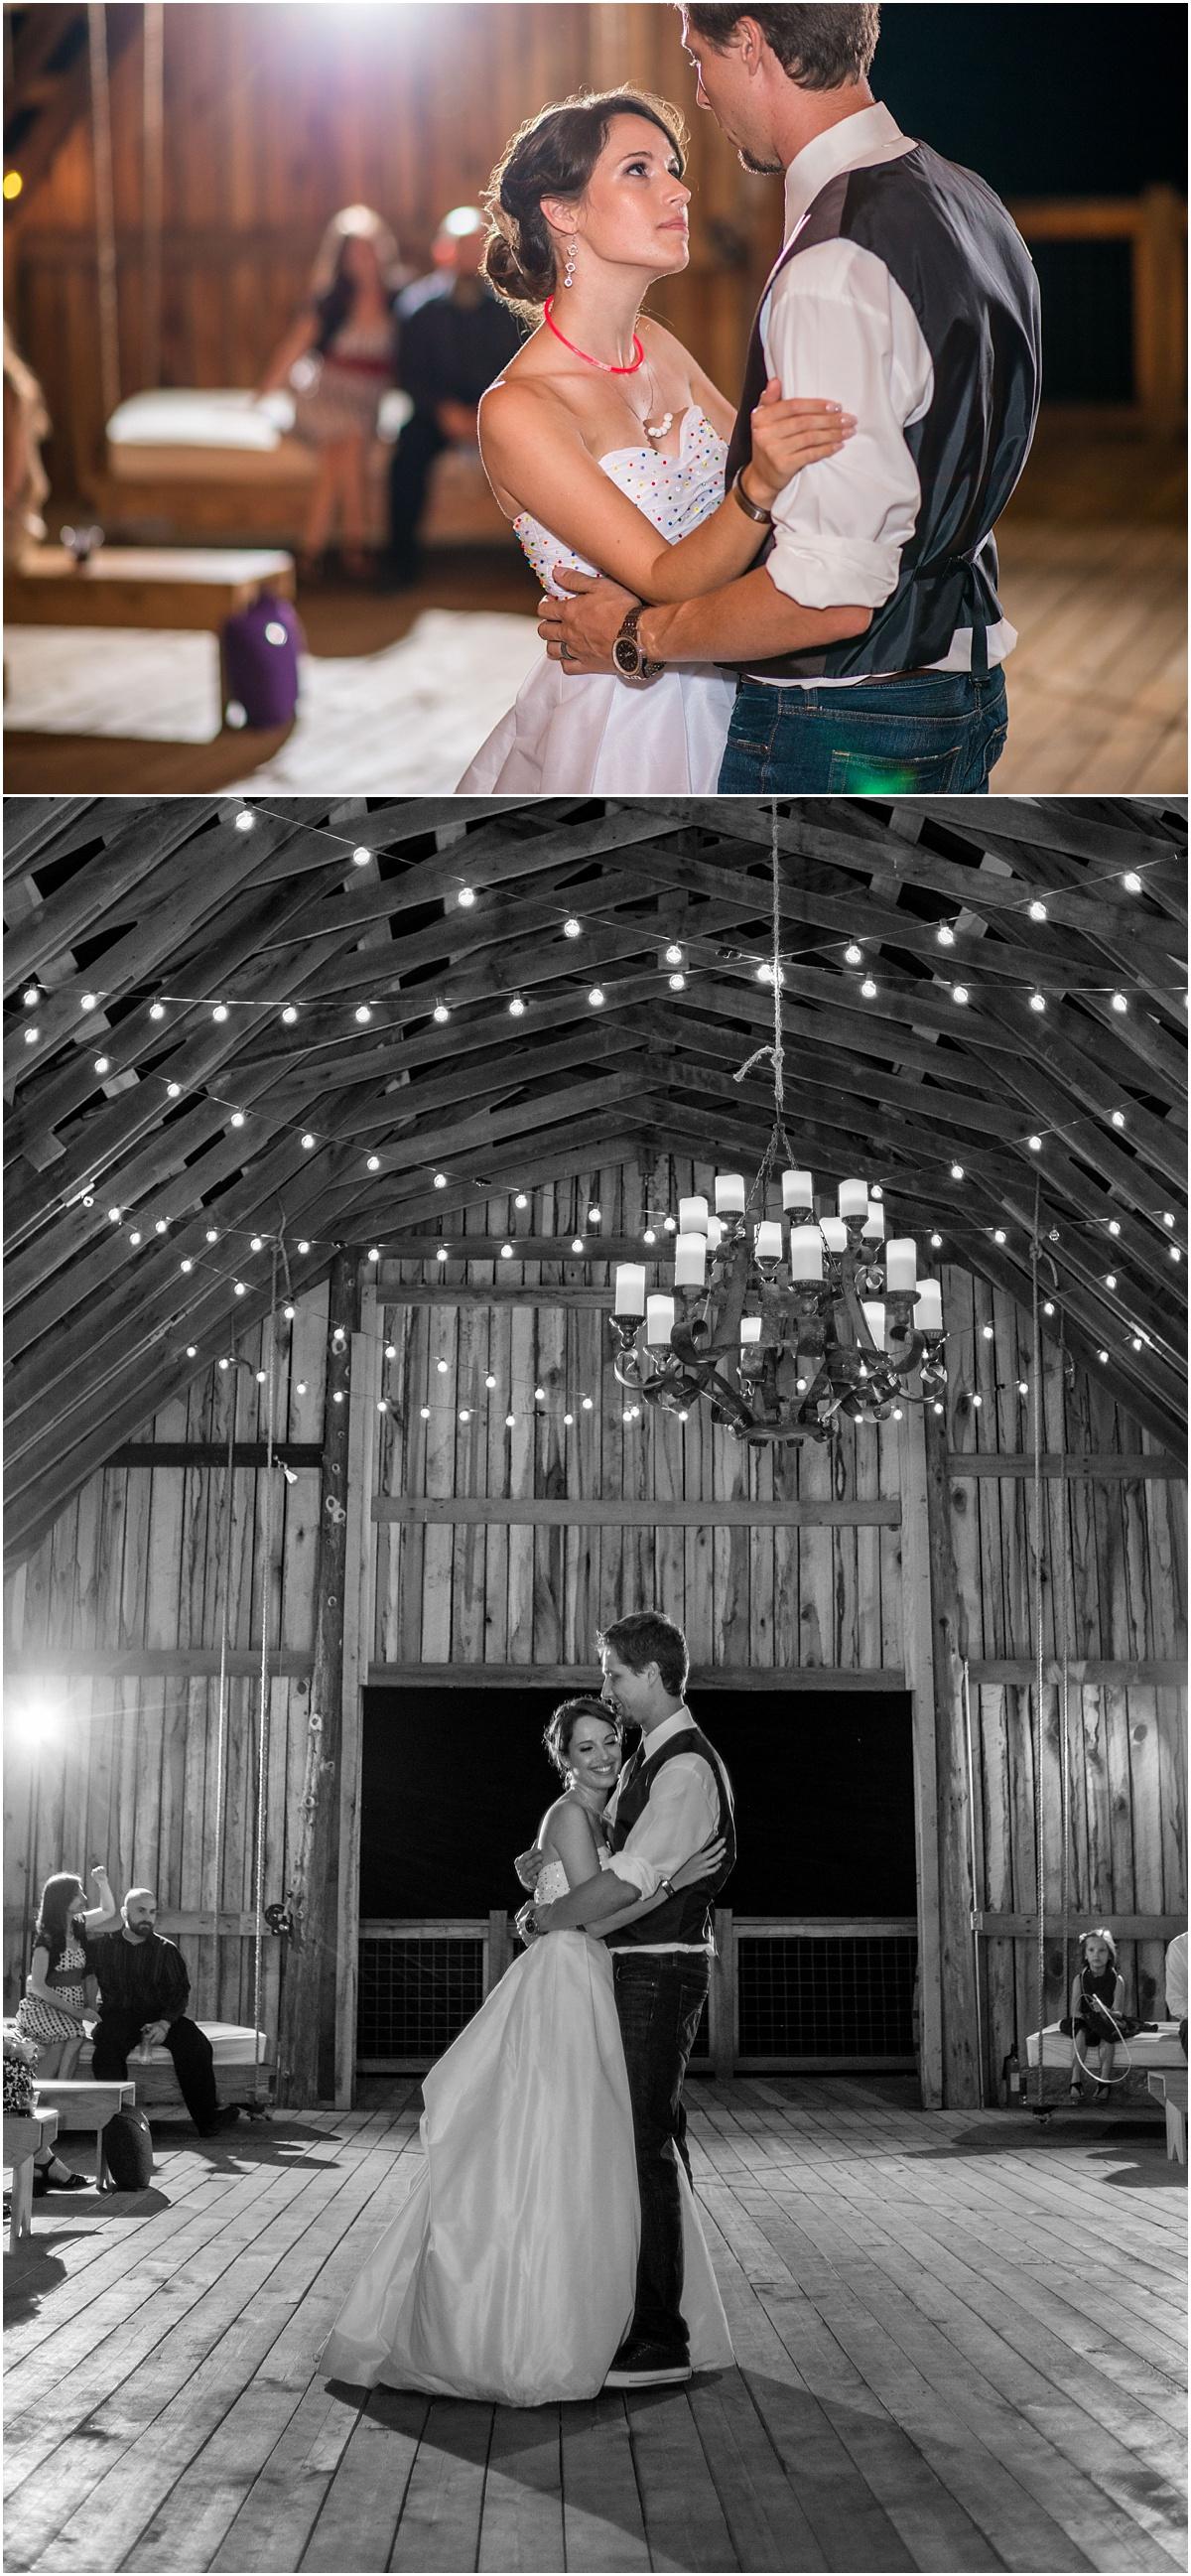 Greg Smit Photography Nashville wedding photographer the Wrens Nest_014